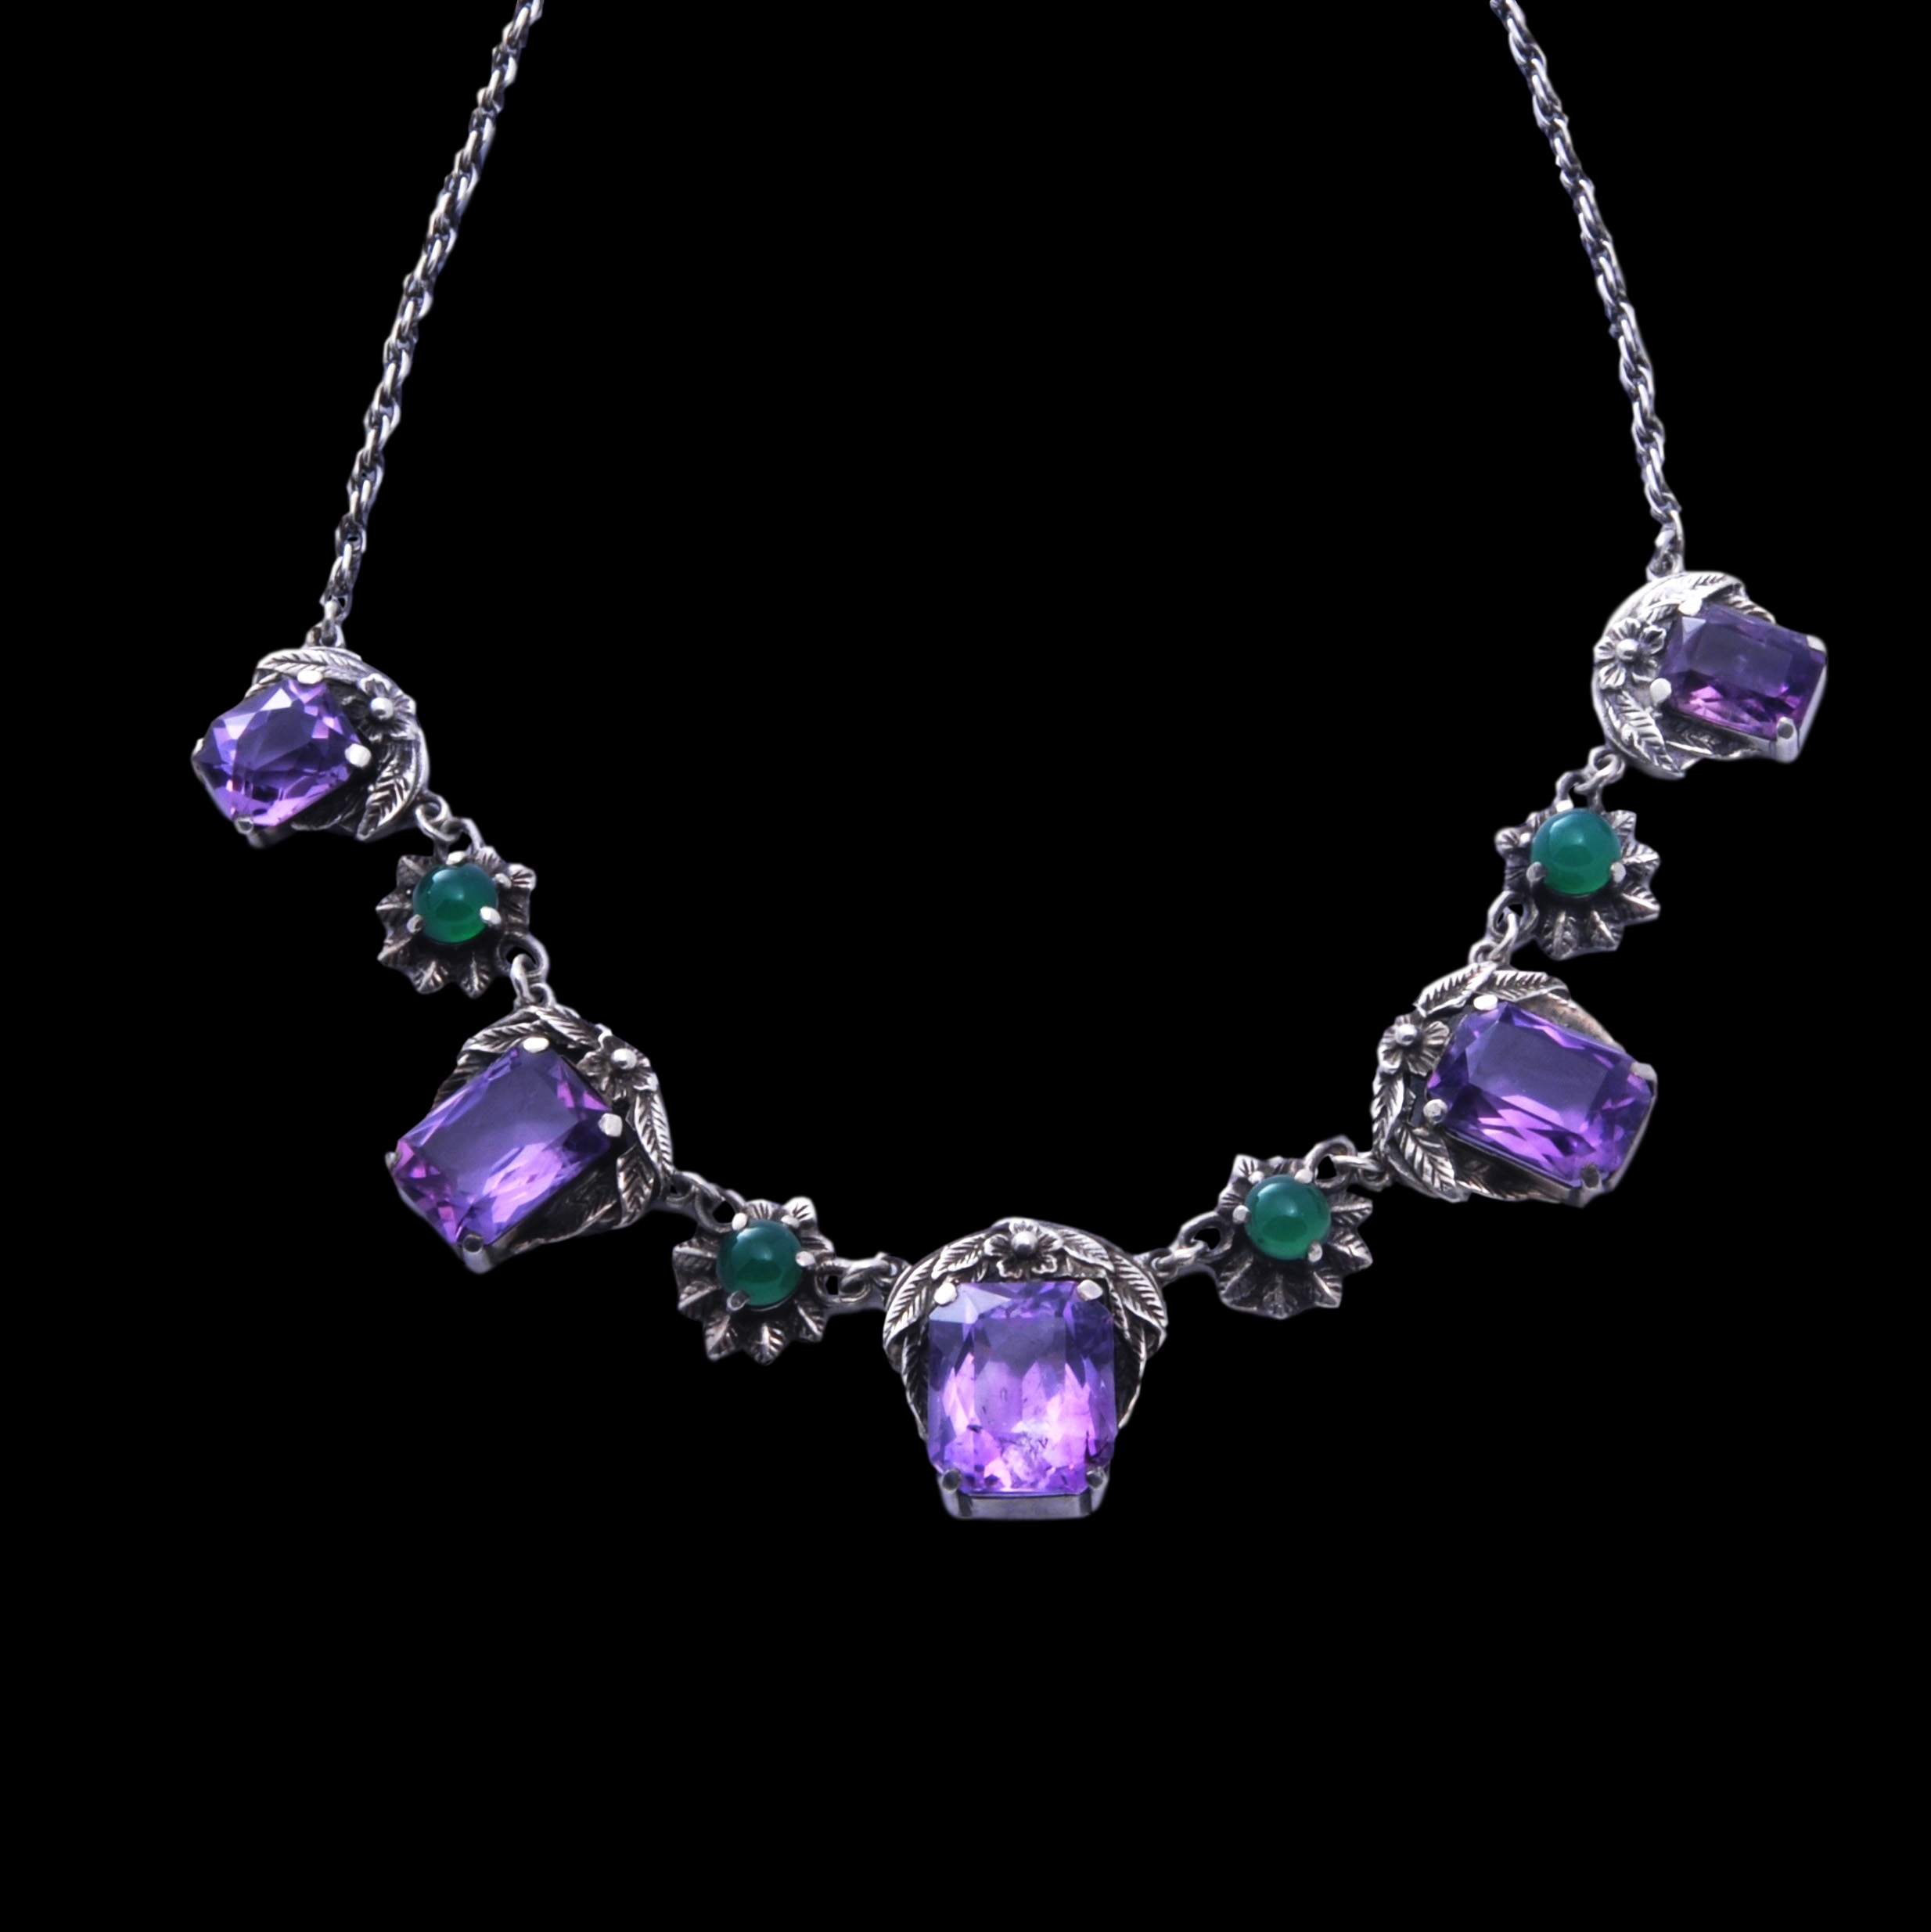 Bernard Instone necklace